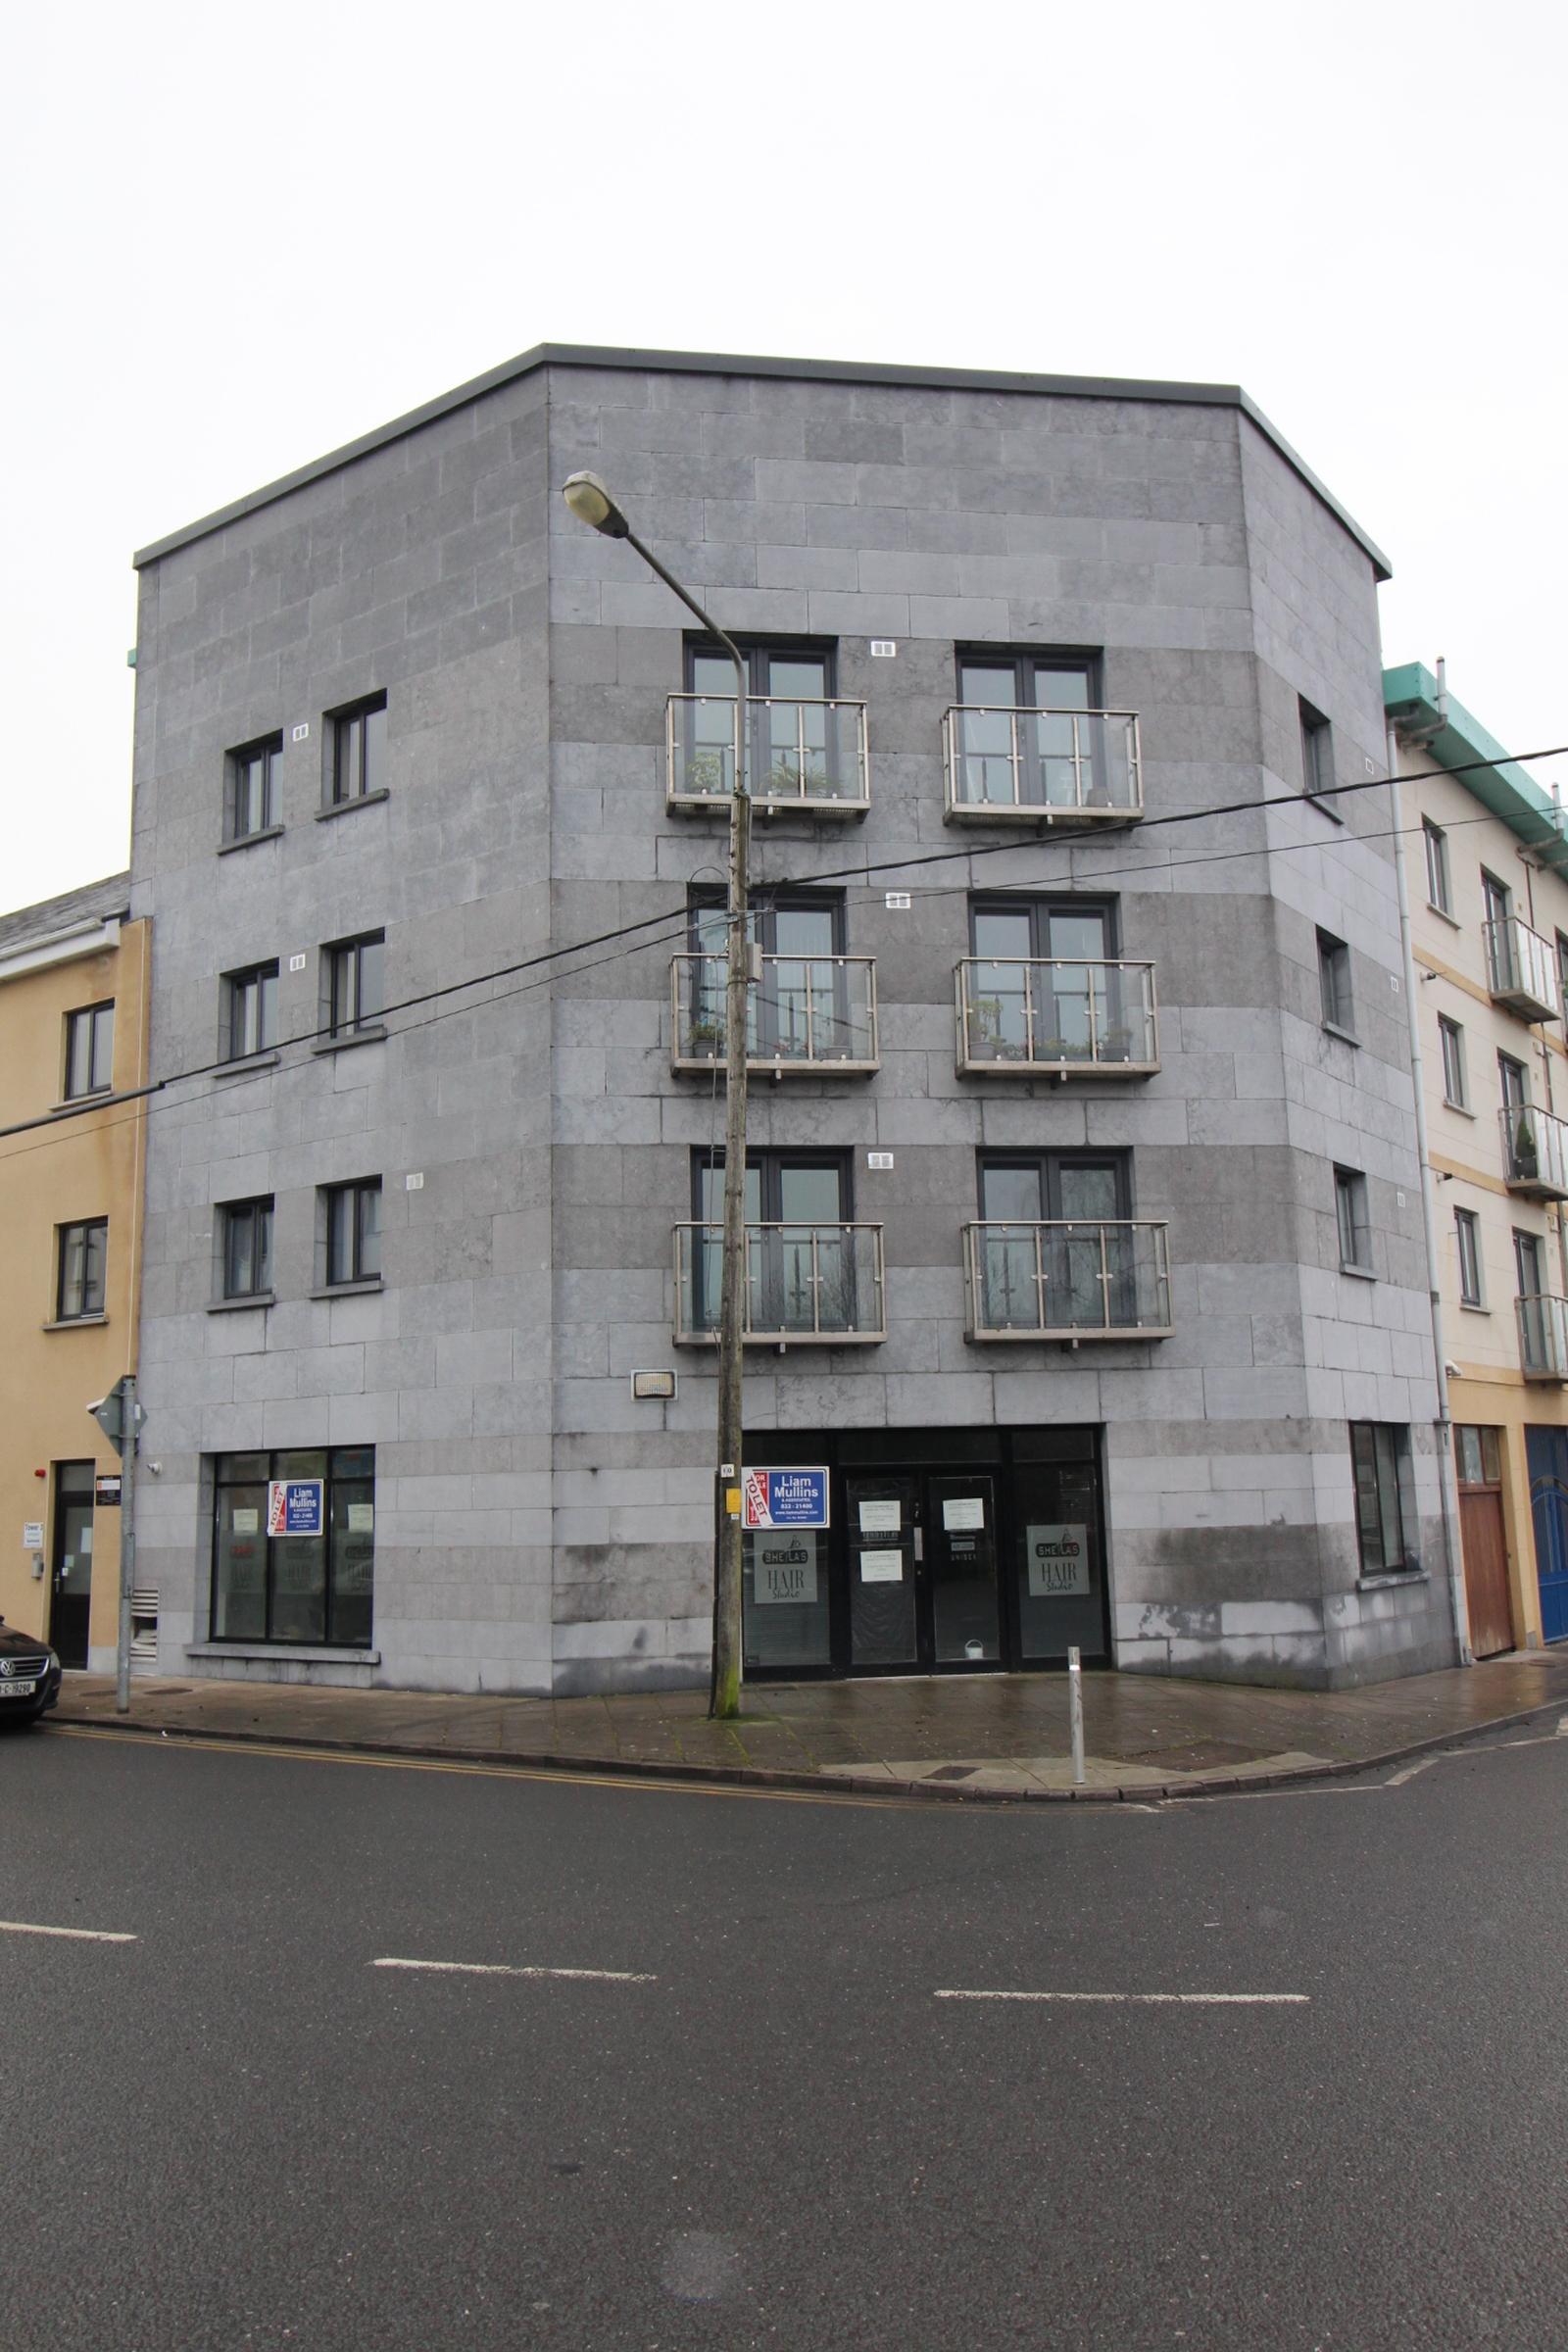 Unit 1, Fairgreen, New Road, Mallow, Co. Cork